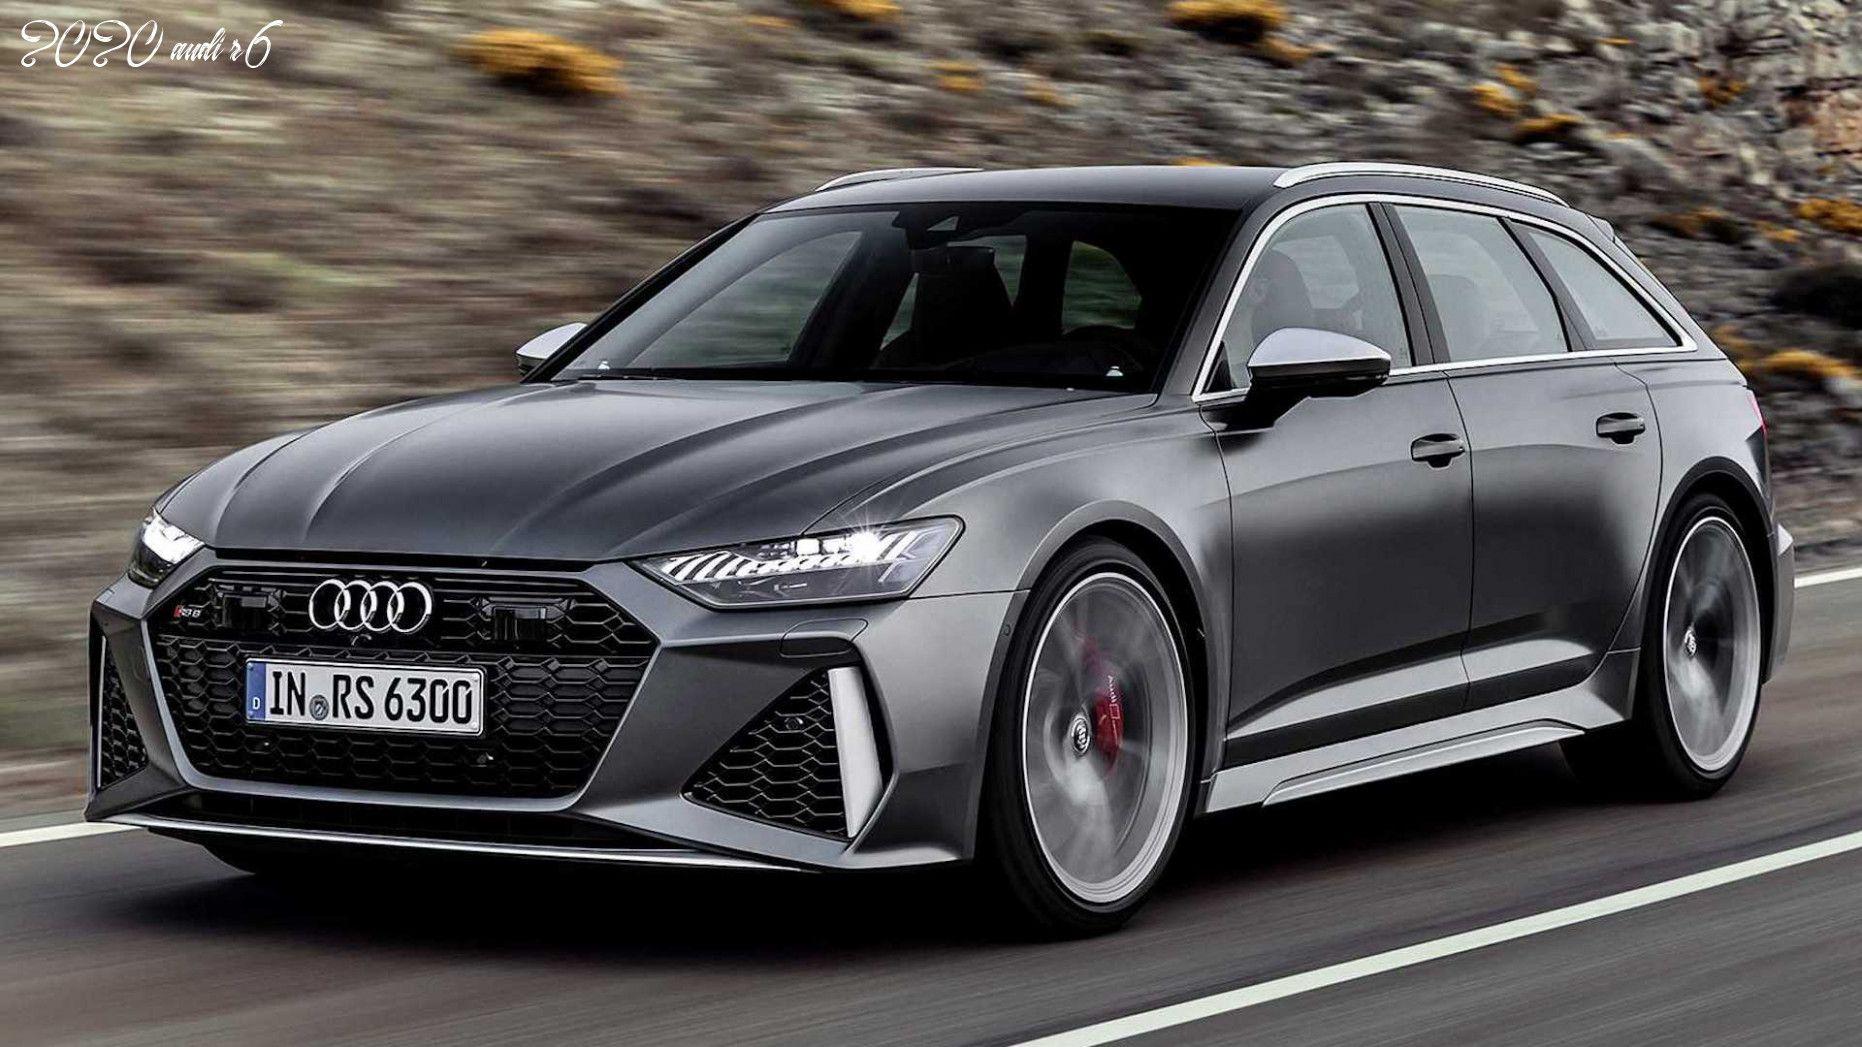 2020 Audi R6 In 2020 Audi Wagon Audi Rs6 Audi Allroad